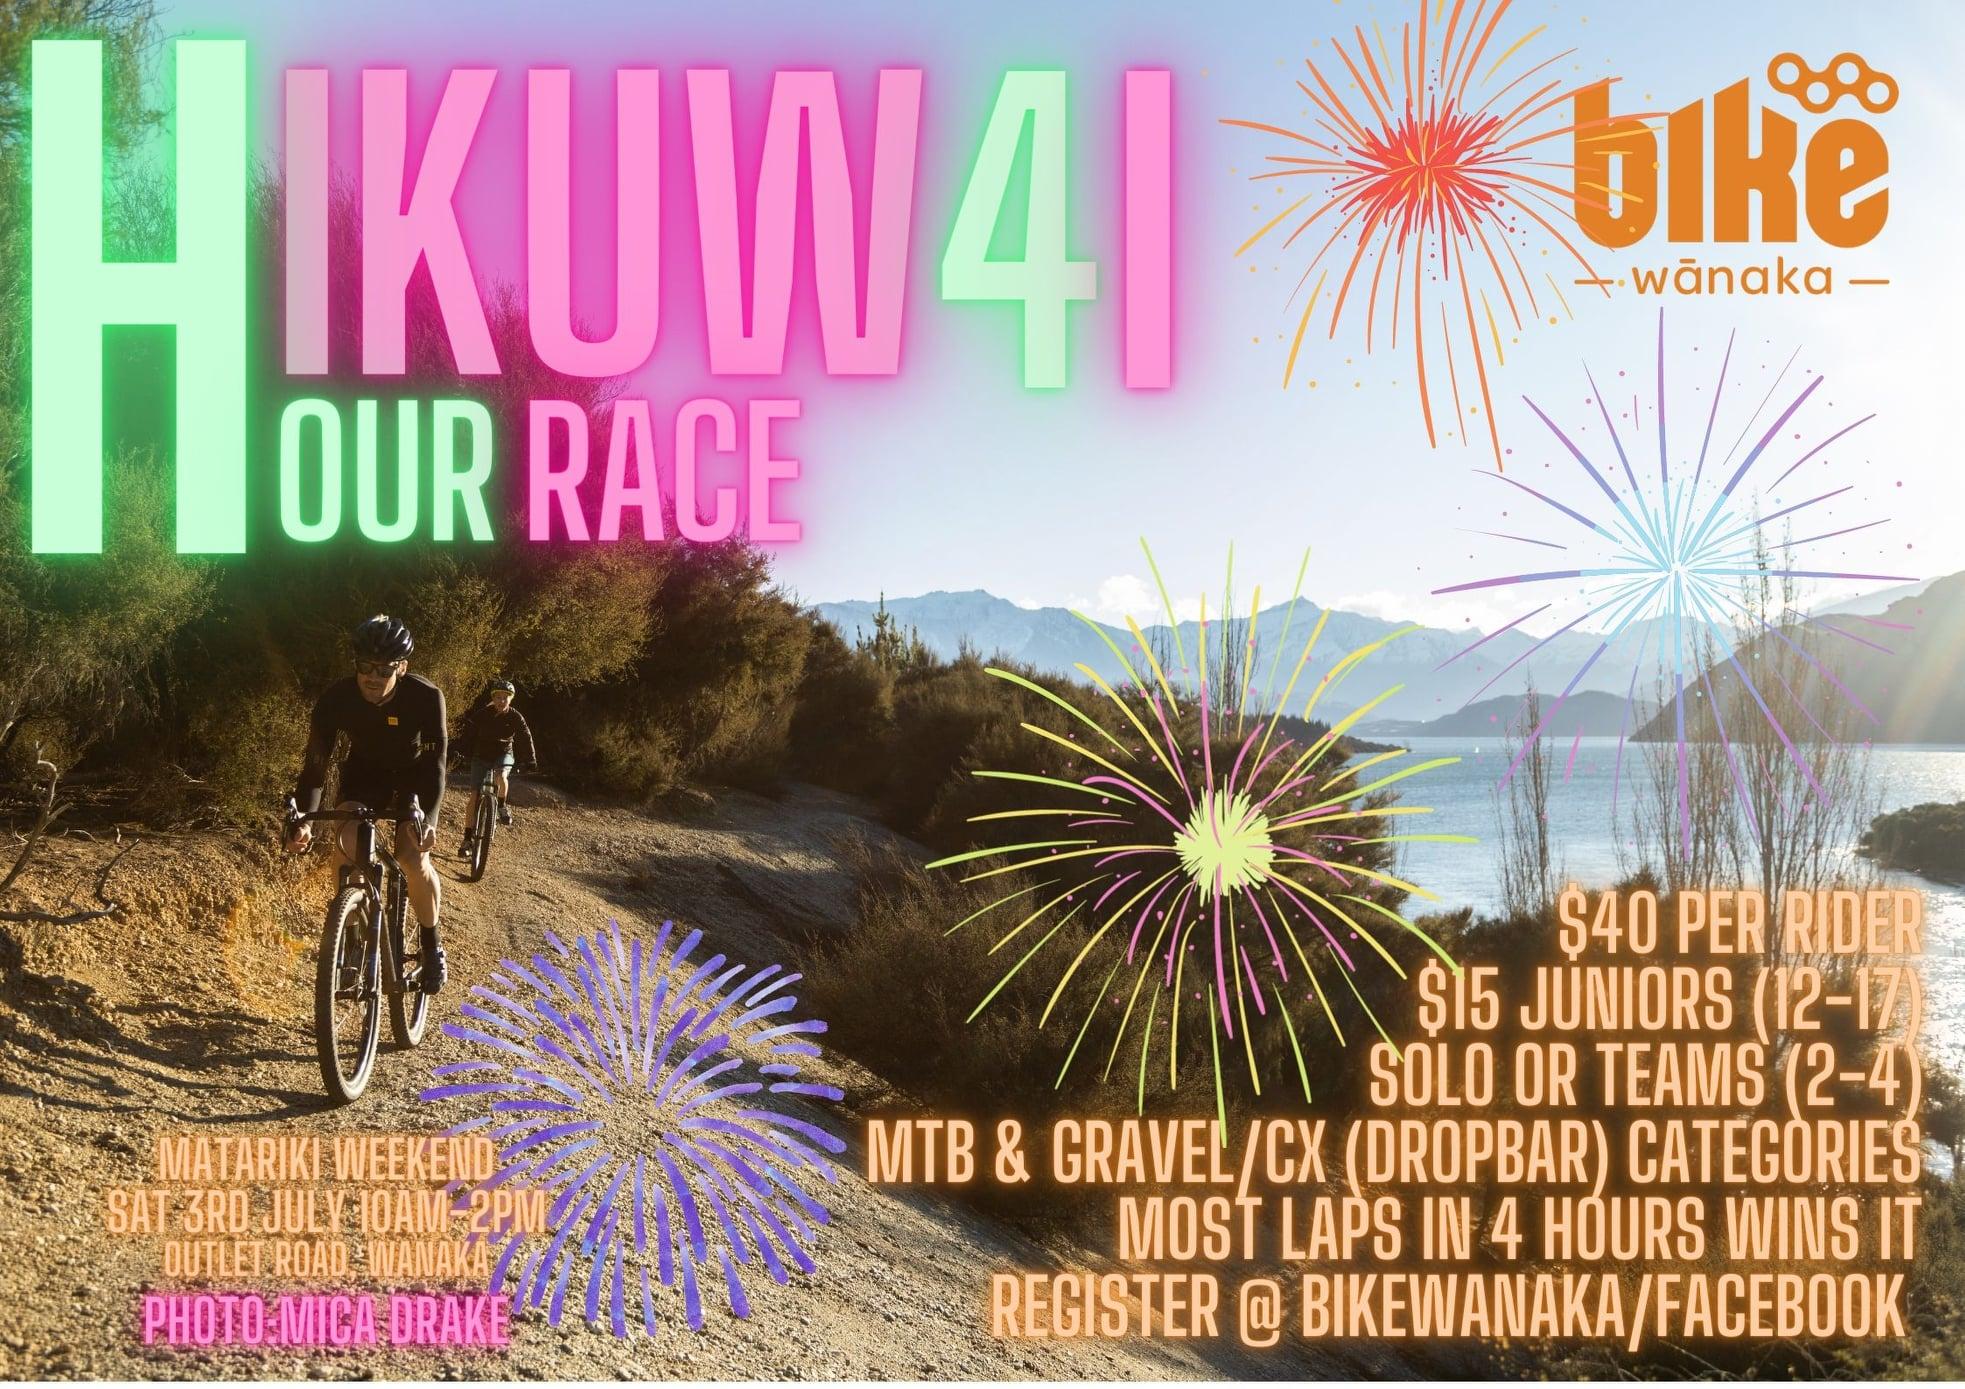 Hikuwai 4 Hour Race - POSTPONED